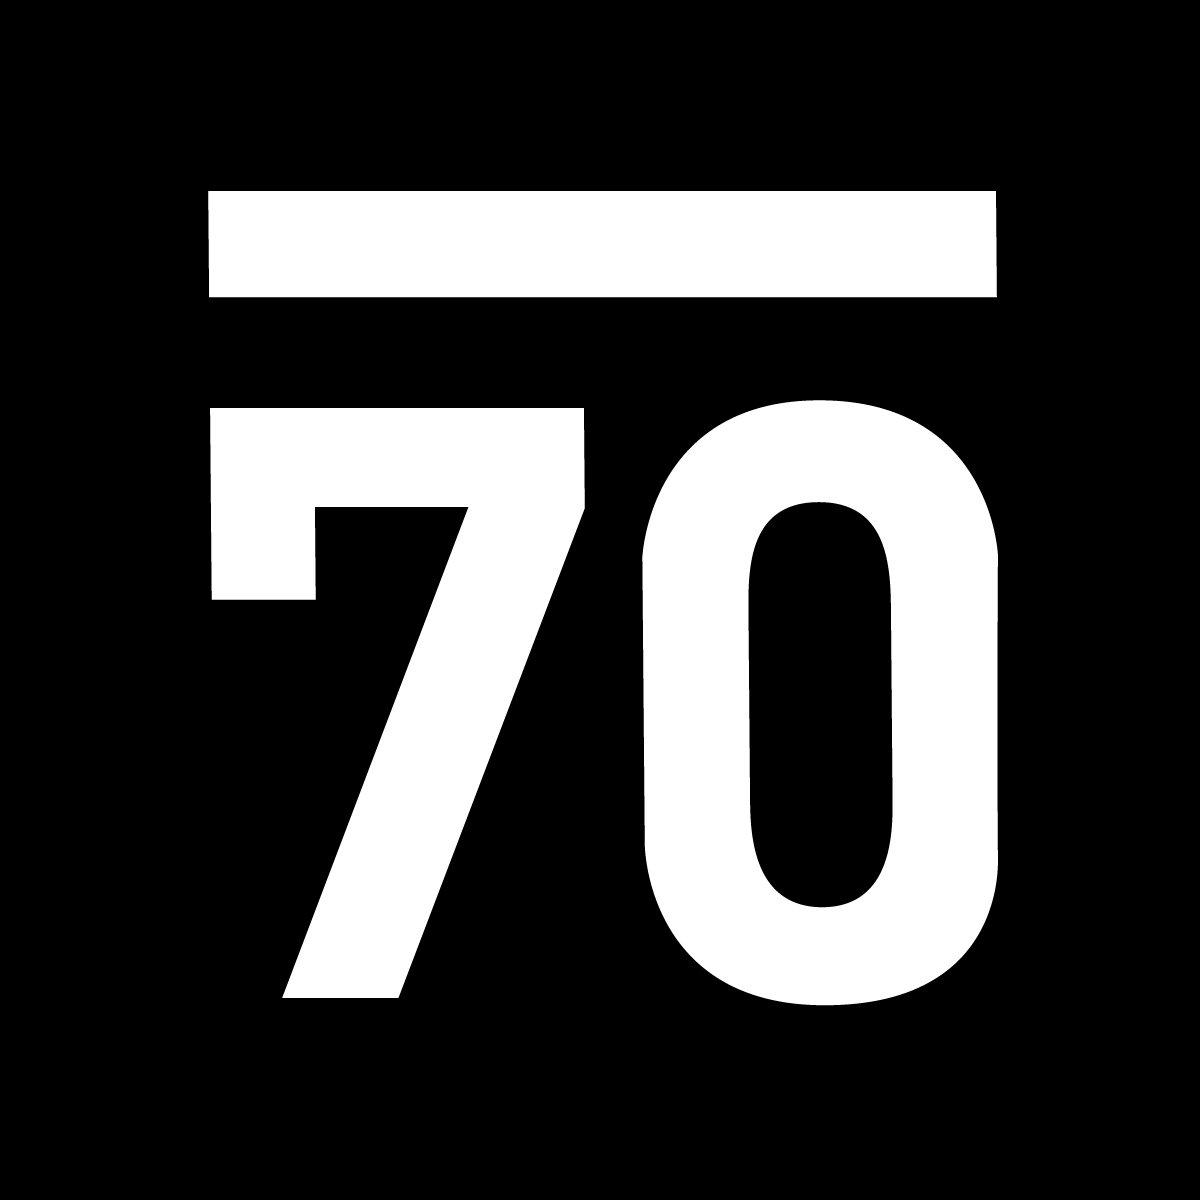 Sub 70 Golf